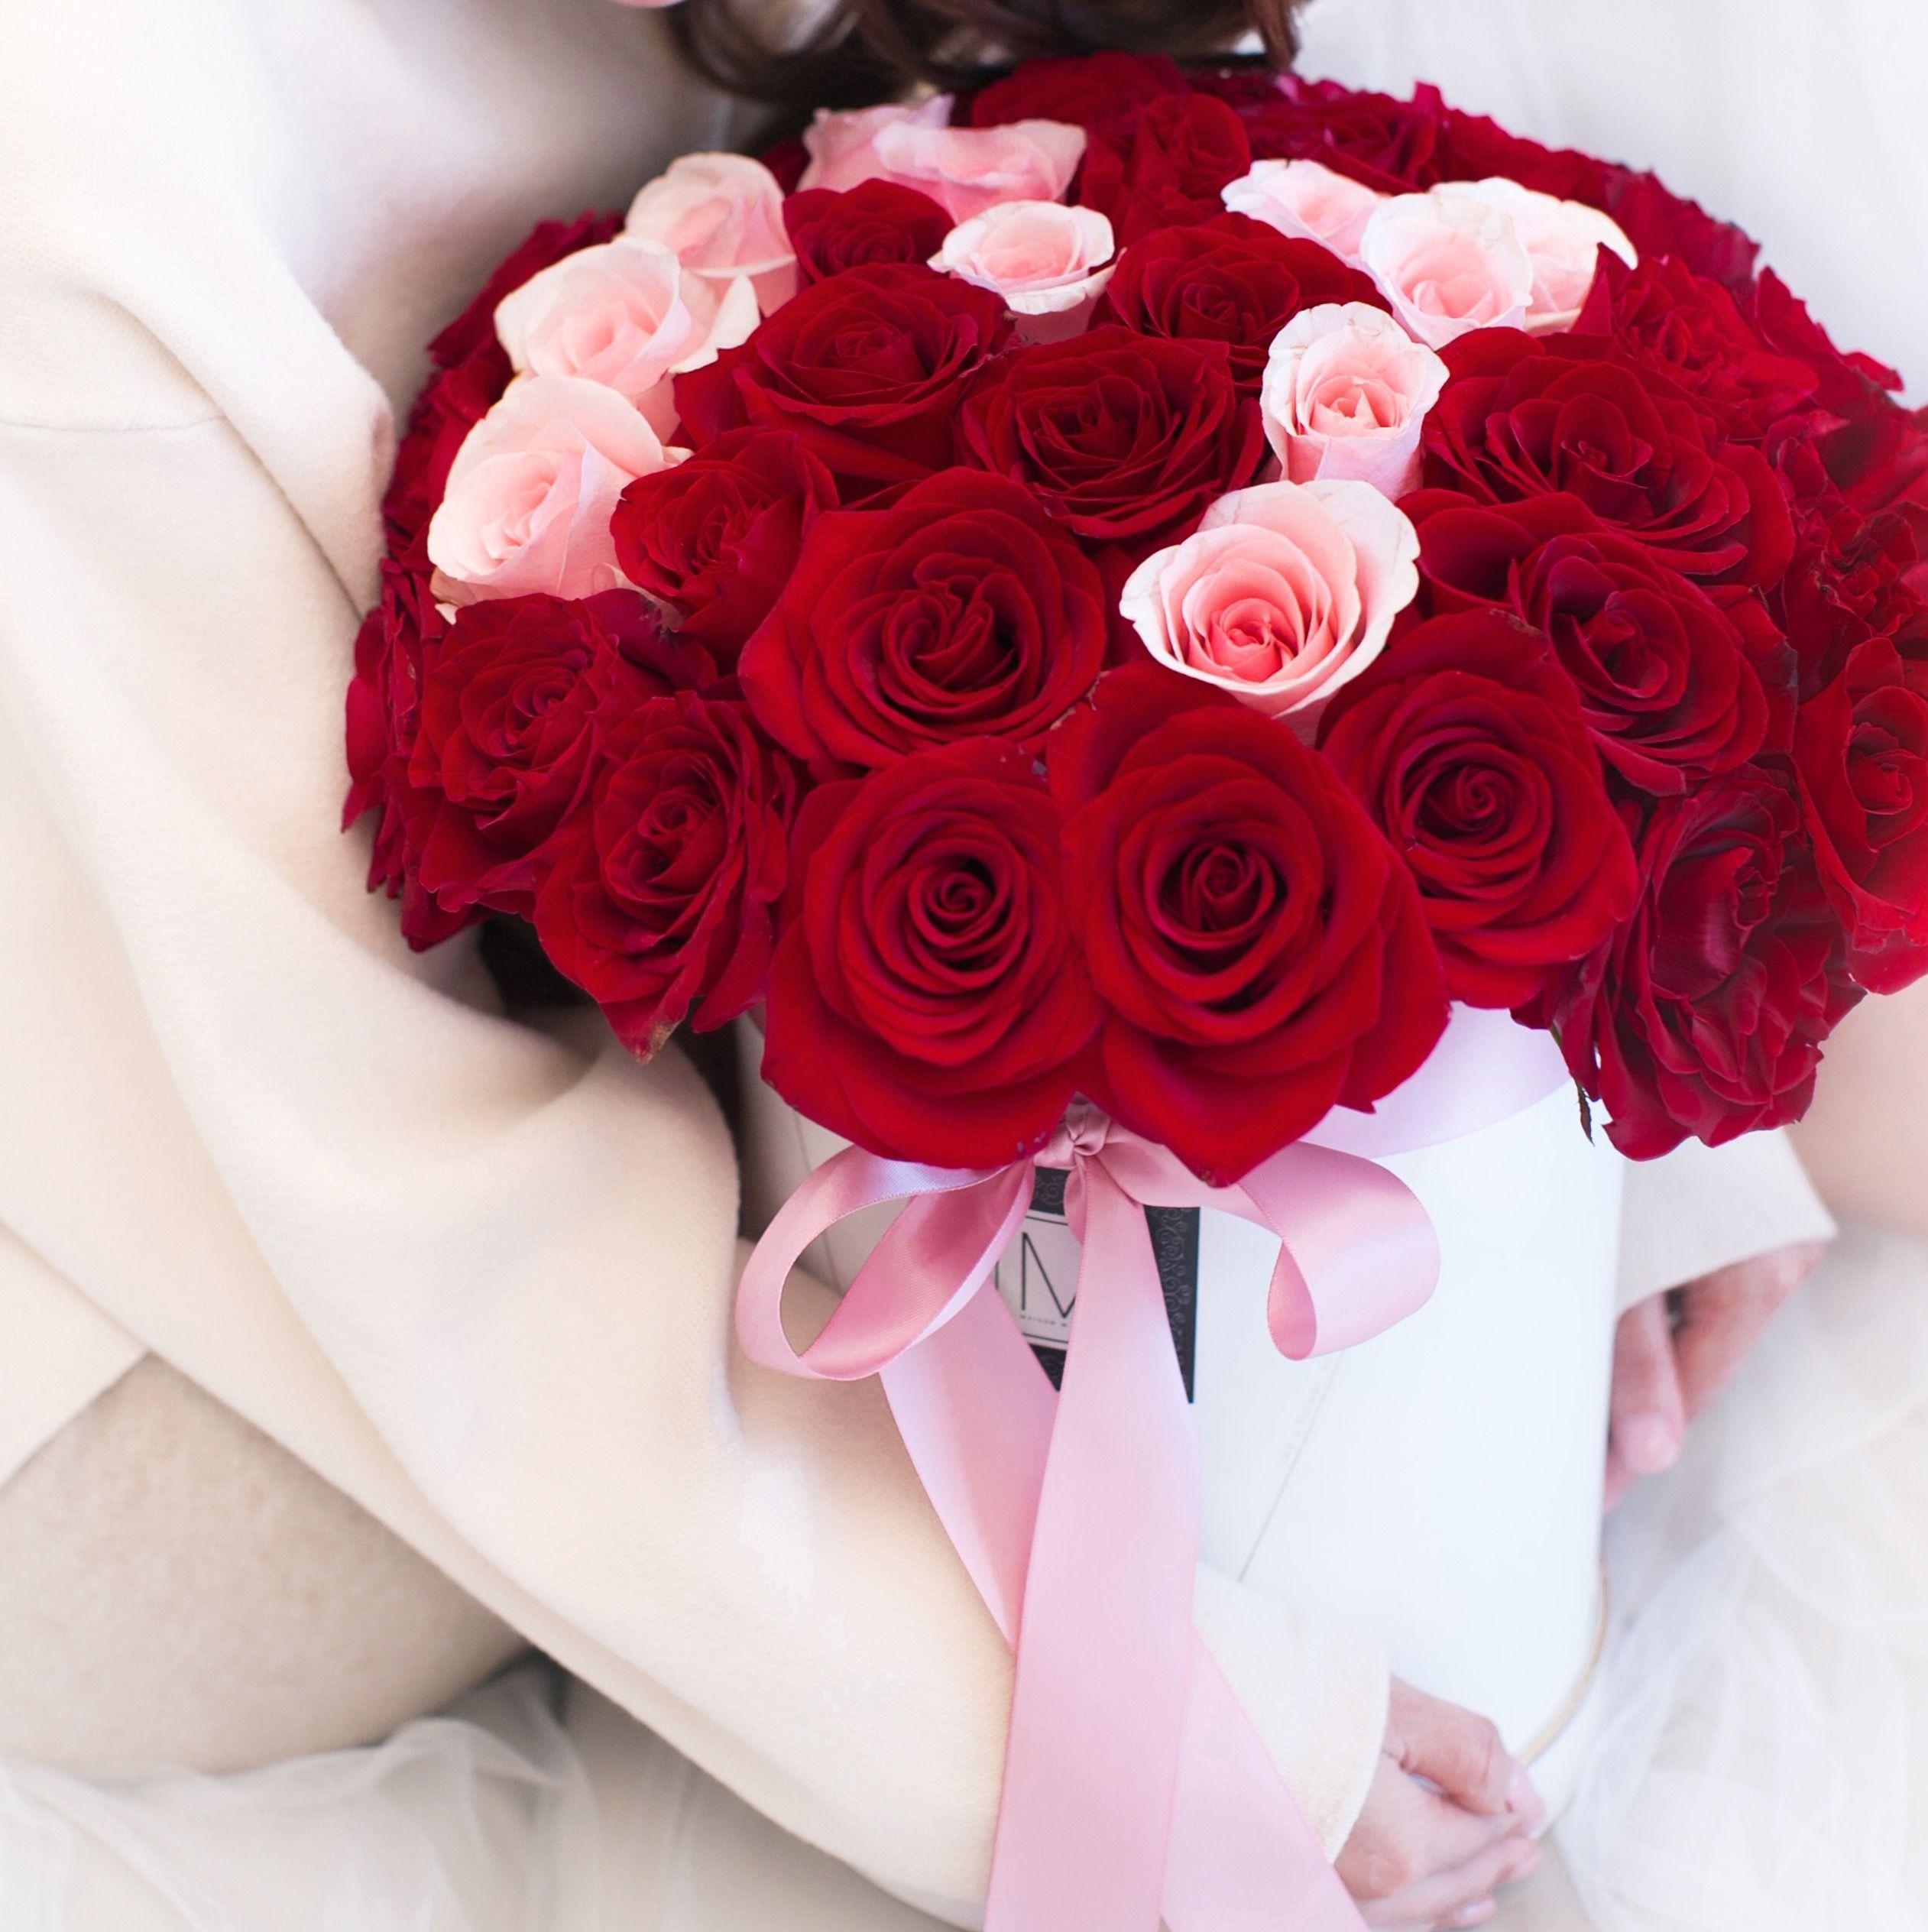 Amour (Deluxe) Maison M Floral maisonmfloral bloombox